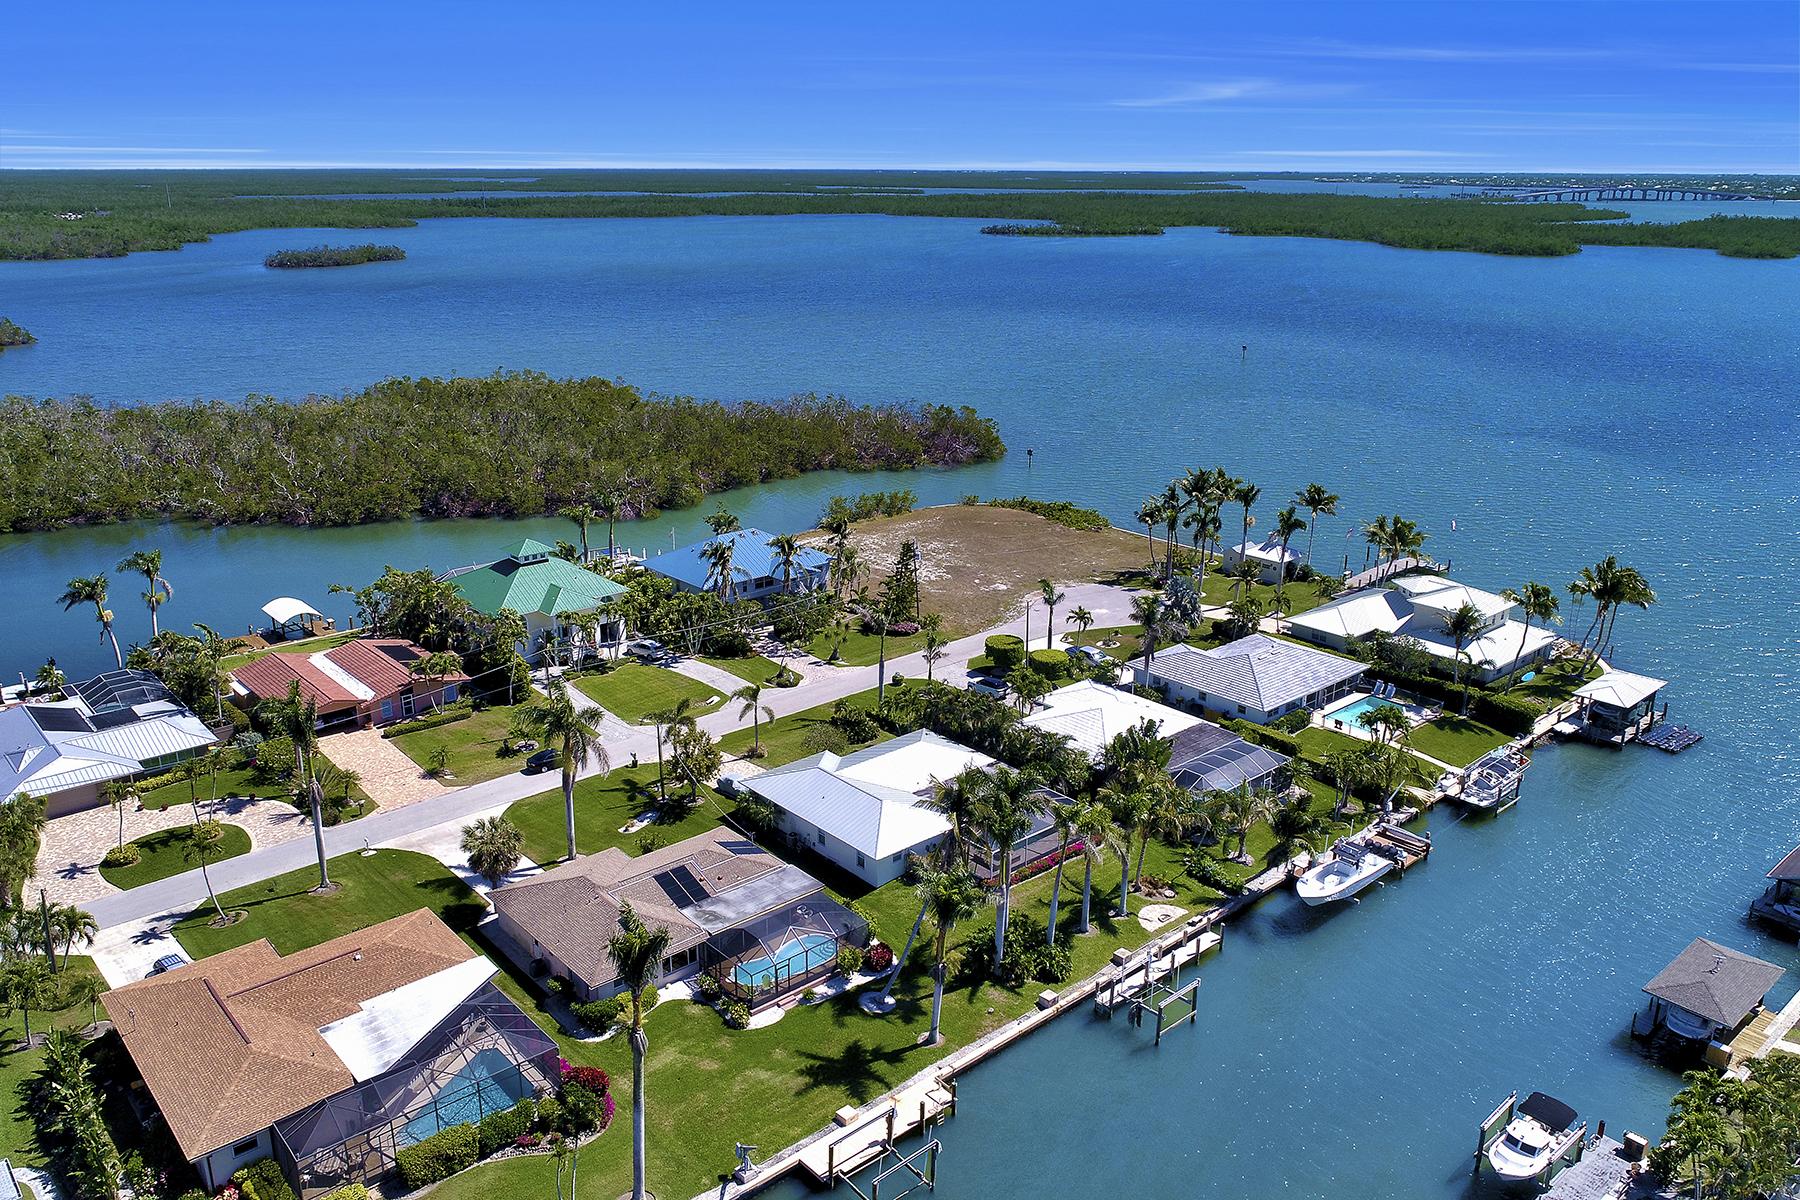 Single Family Home for Sale at ISLES OFCAPRI 422 San Juan Ave, Naples, Florida, 34113 United States